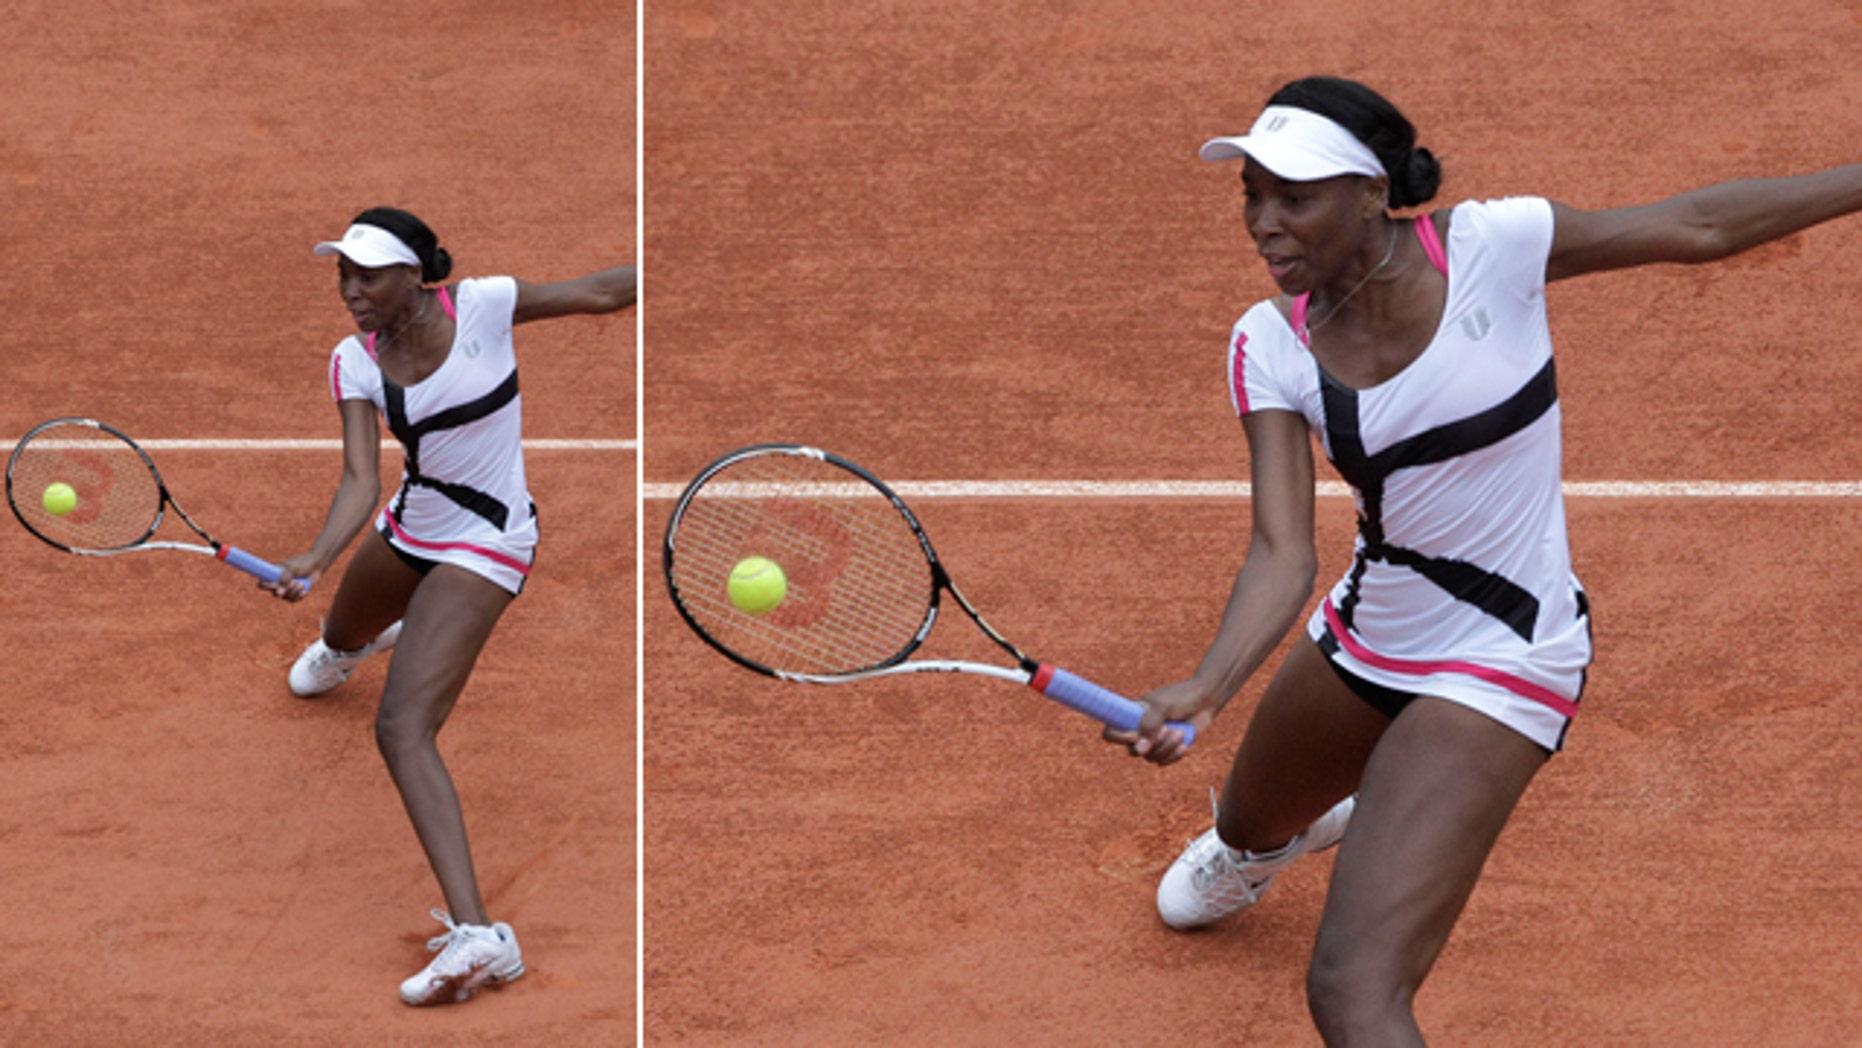 May 30, 2012: Venus Williams of the U.S. returns in her second round match against Agnieszka Radwanska of Poland at the French Open tennis tournament in Roland Garros stadium in Paris.